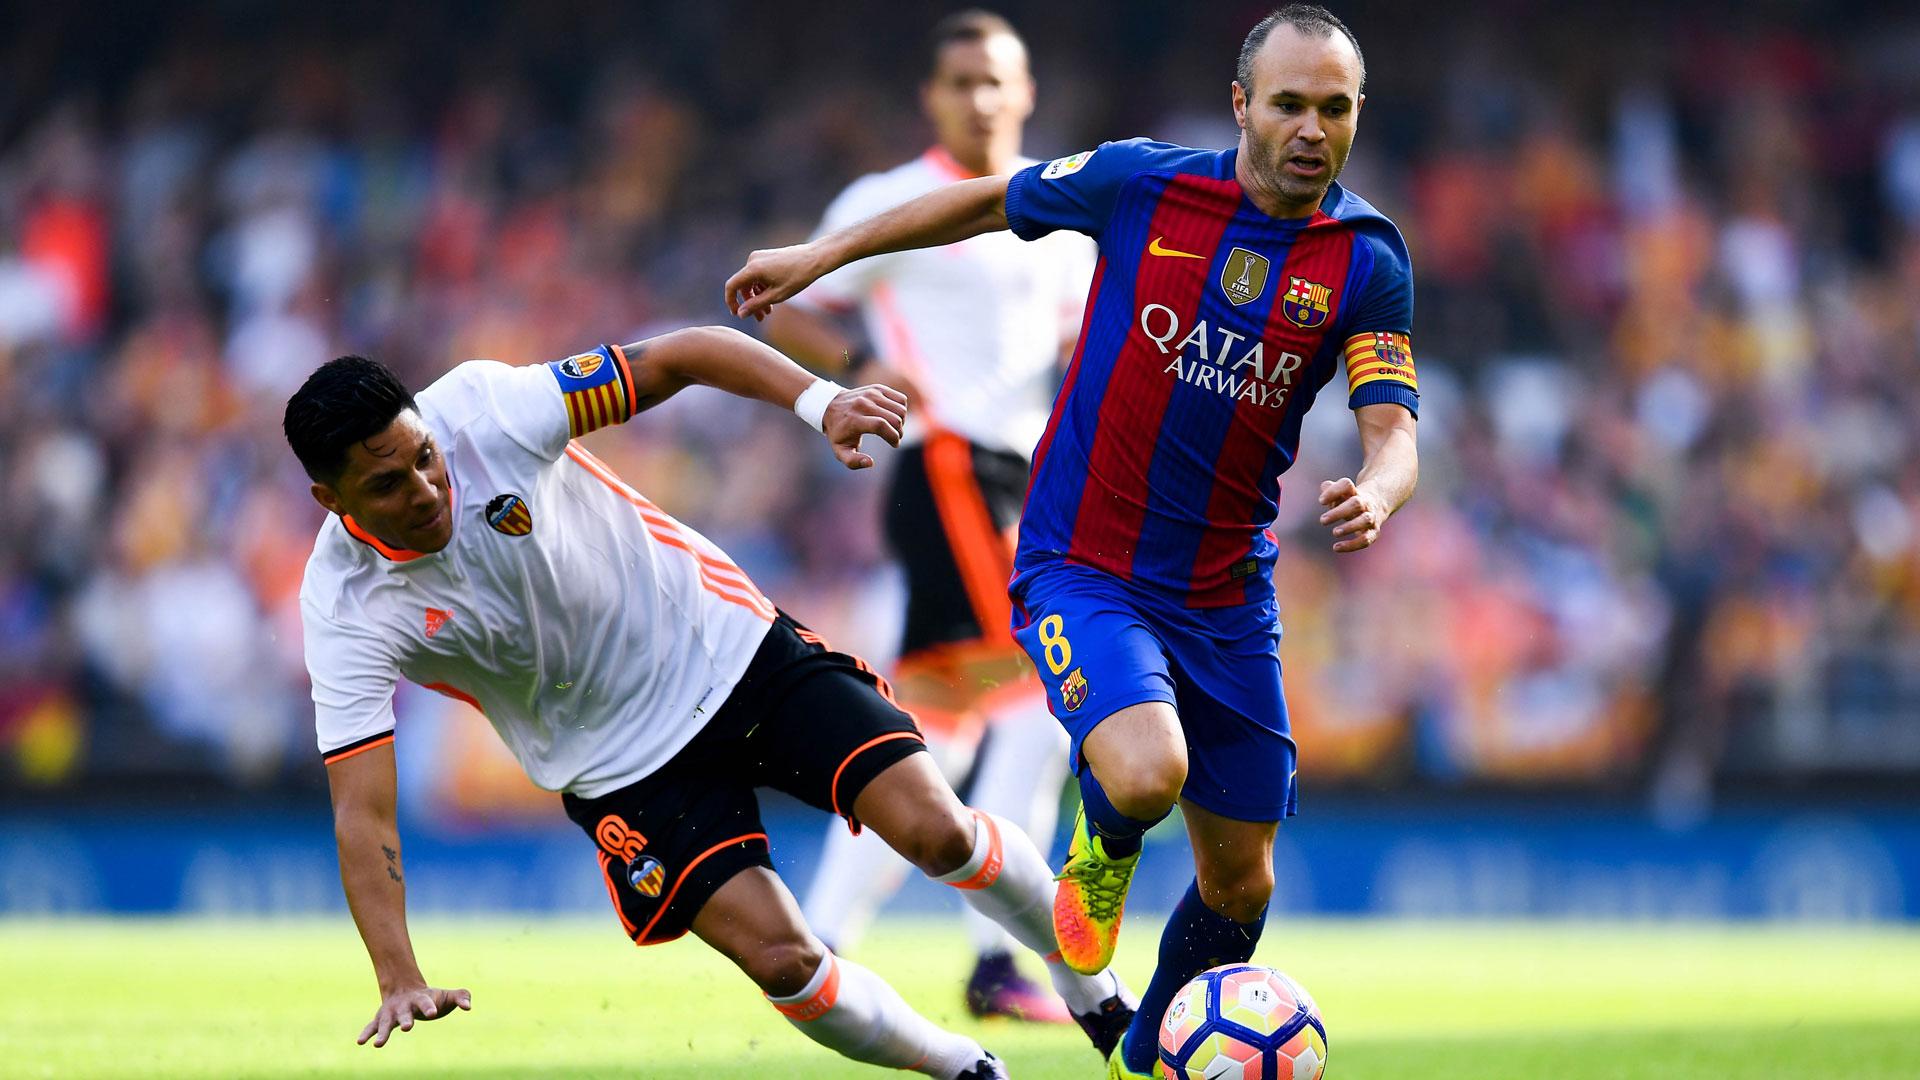 Barcelona divulga que Iniesta será desfalque por até oito semanas